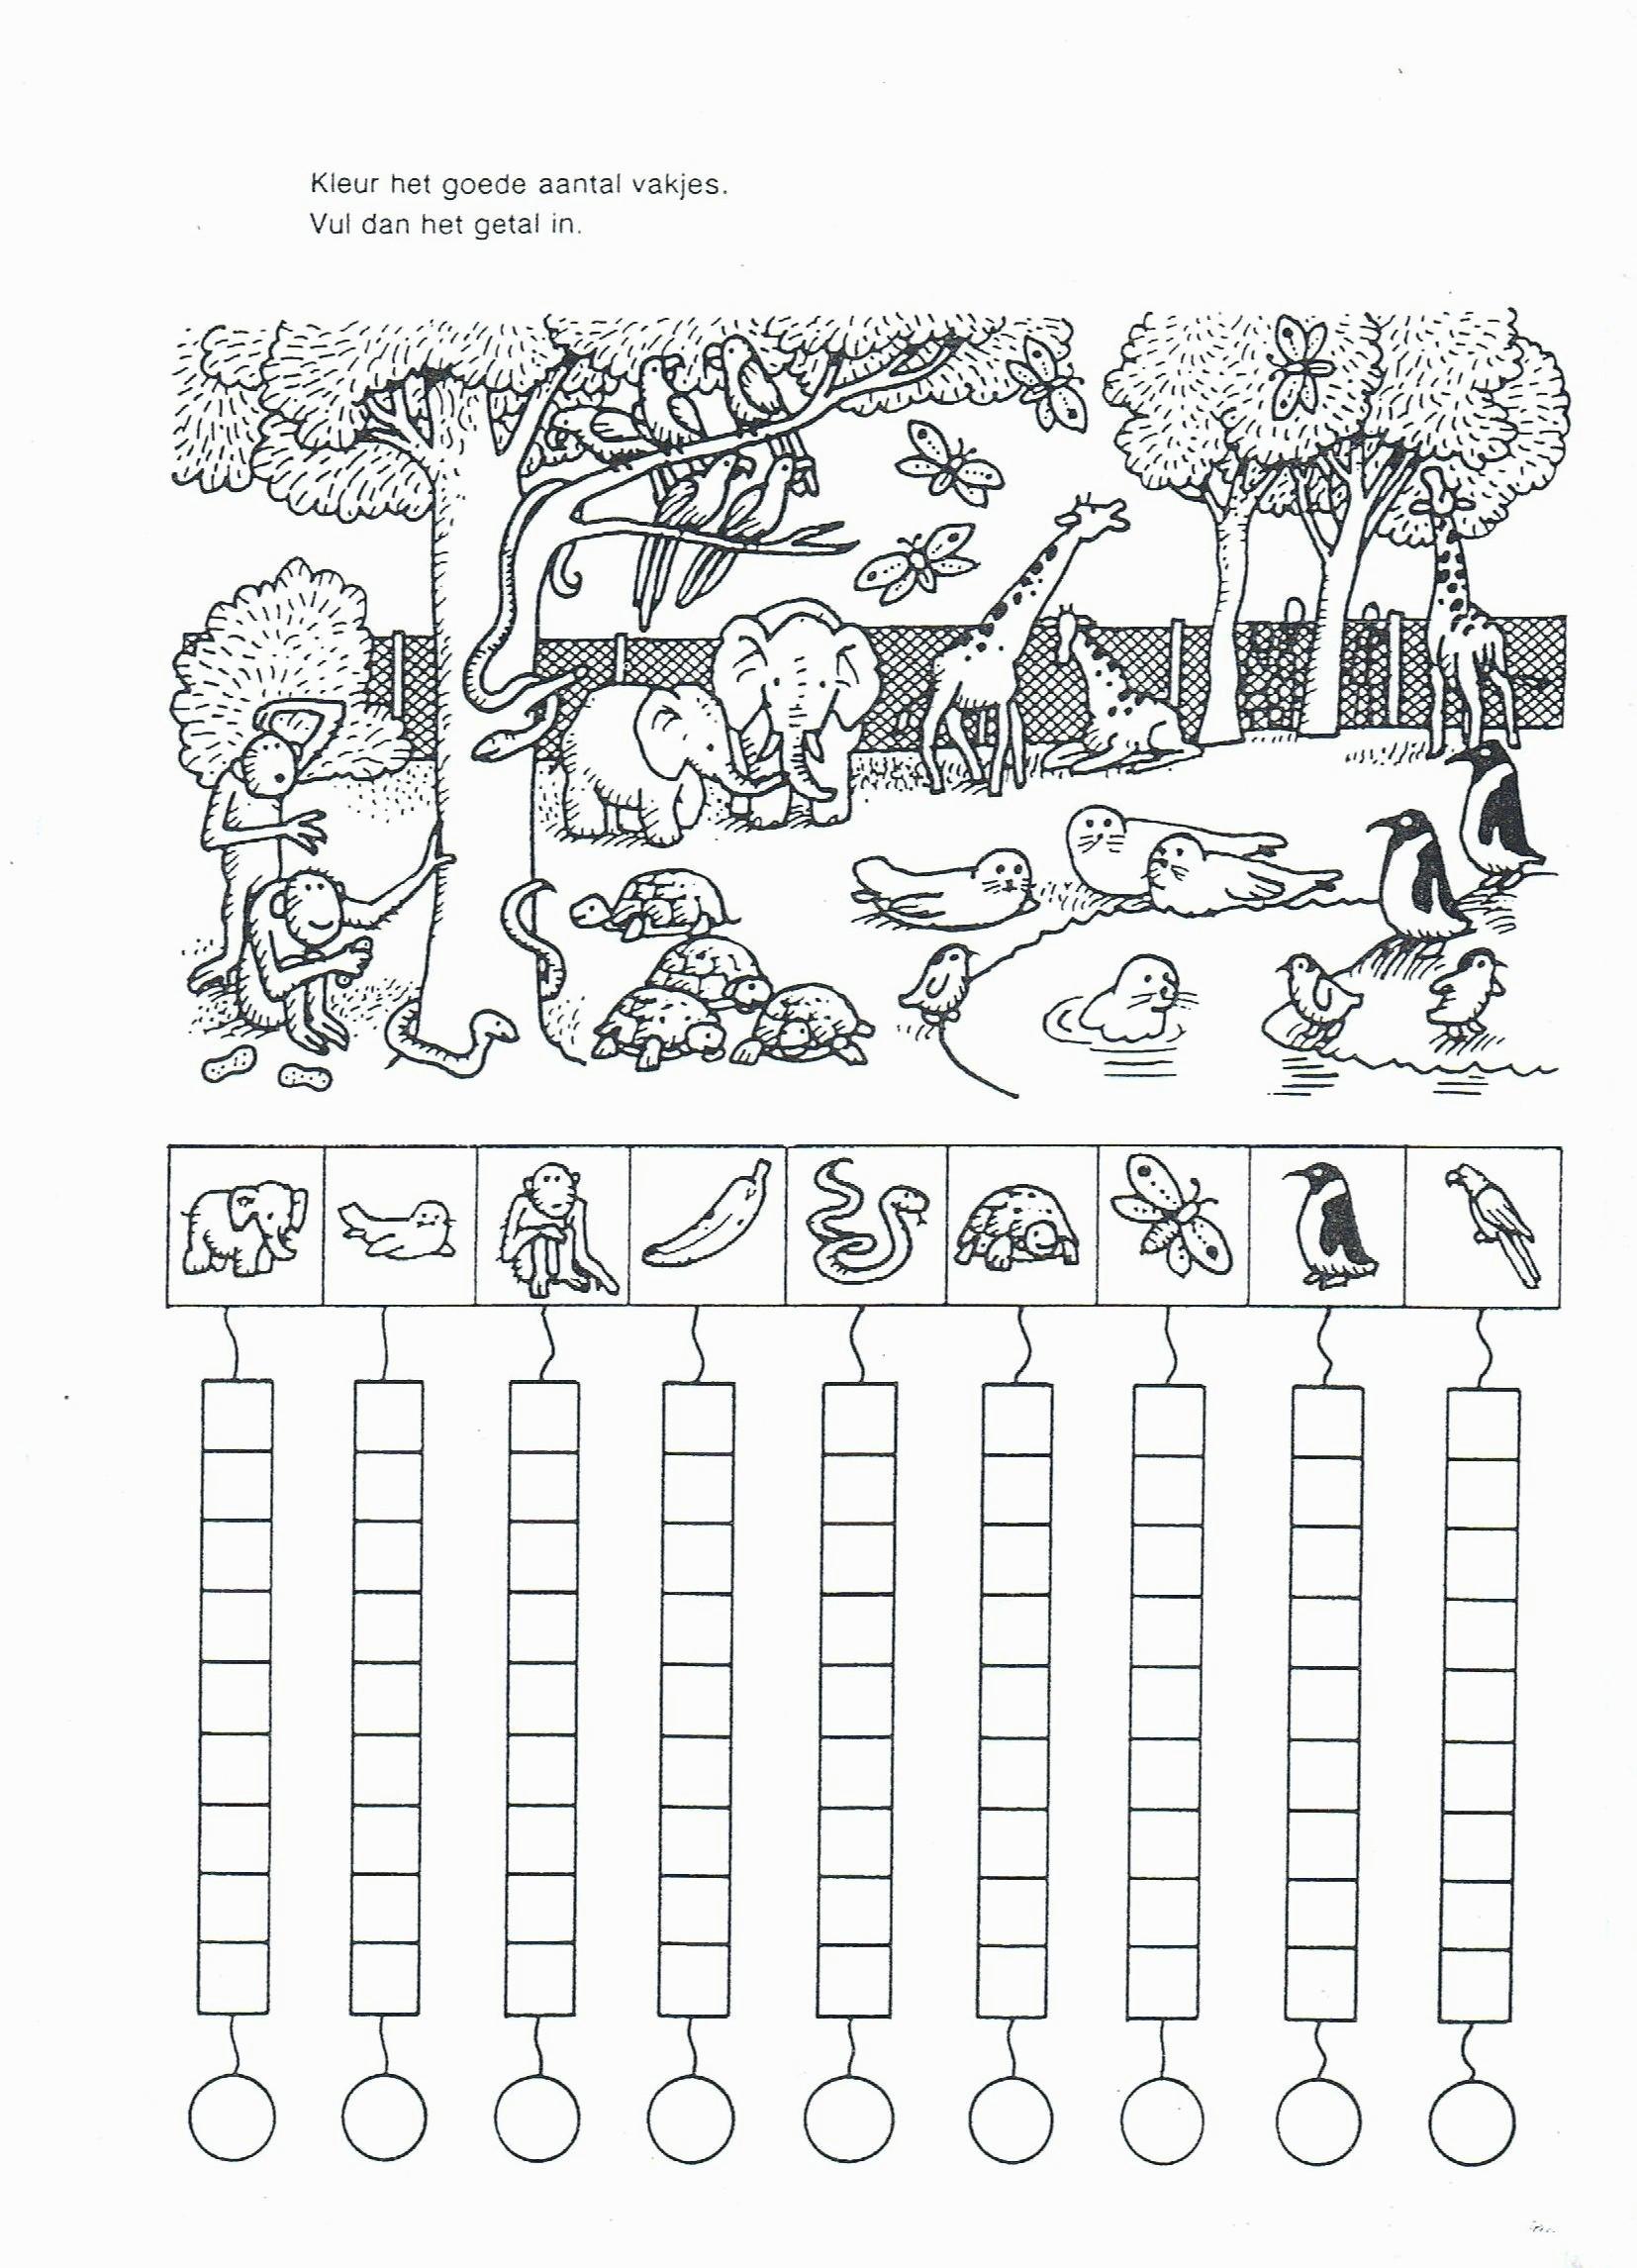 cat crafts for preschoolers awesome kindergarten worksheets easter media cache ec0 pinimg originals 0d of cat